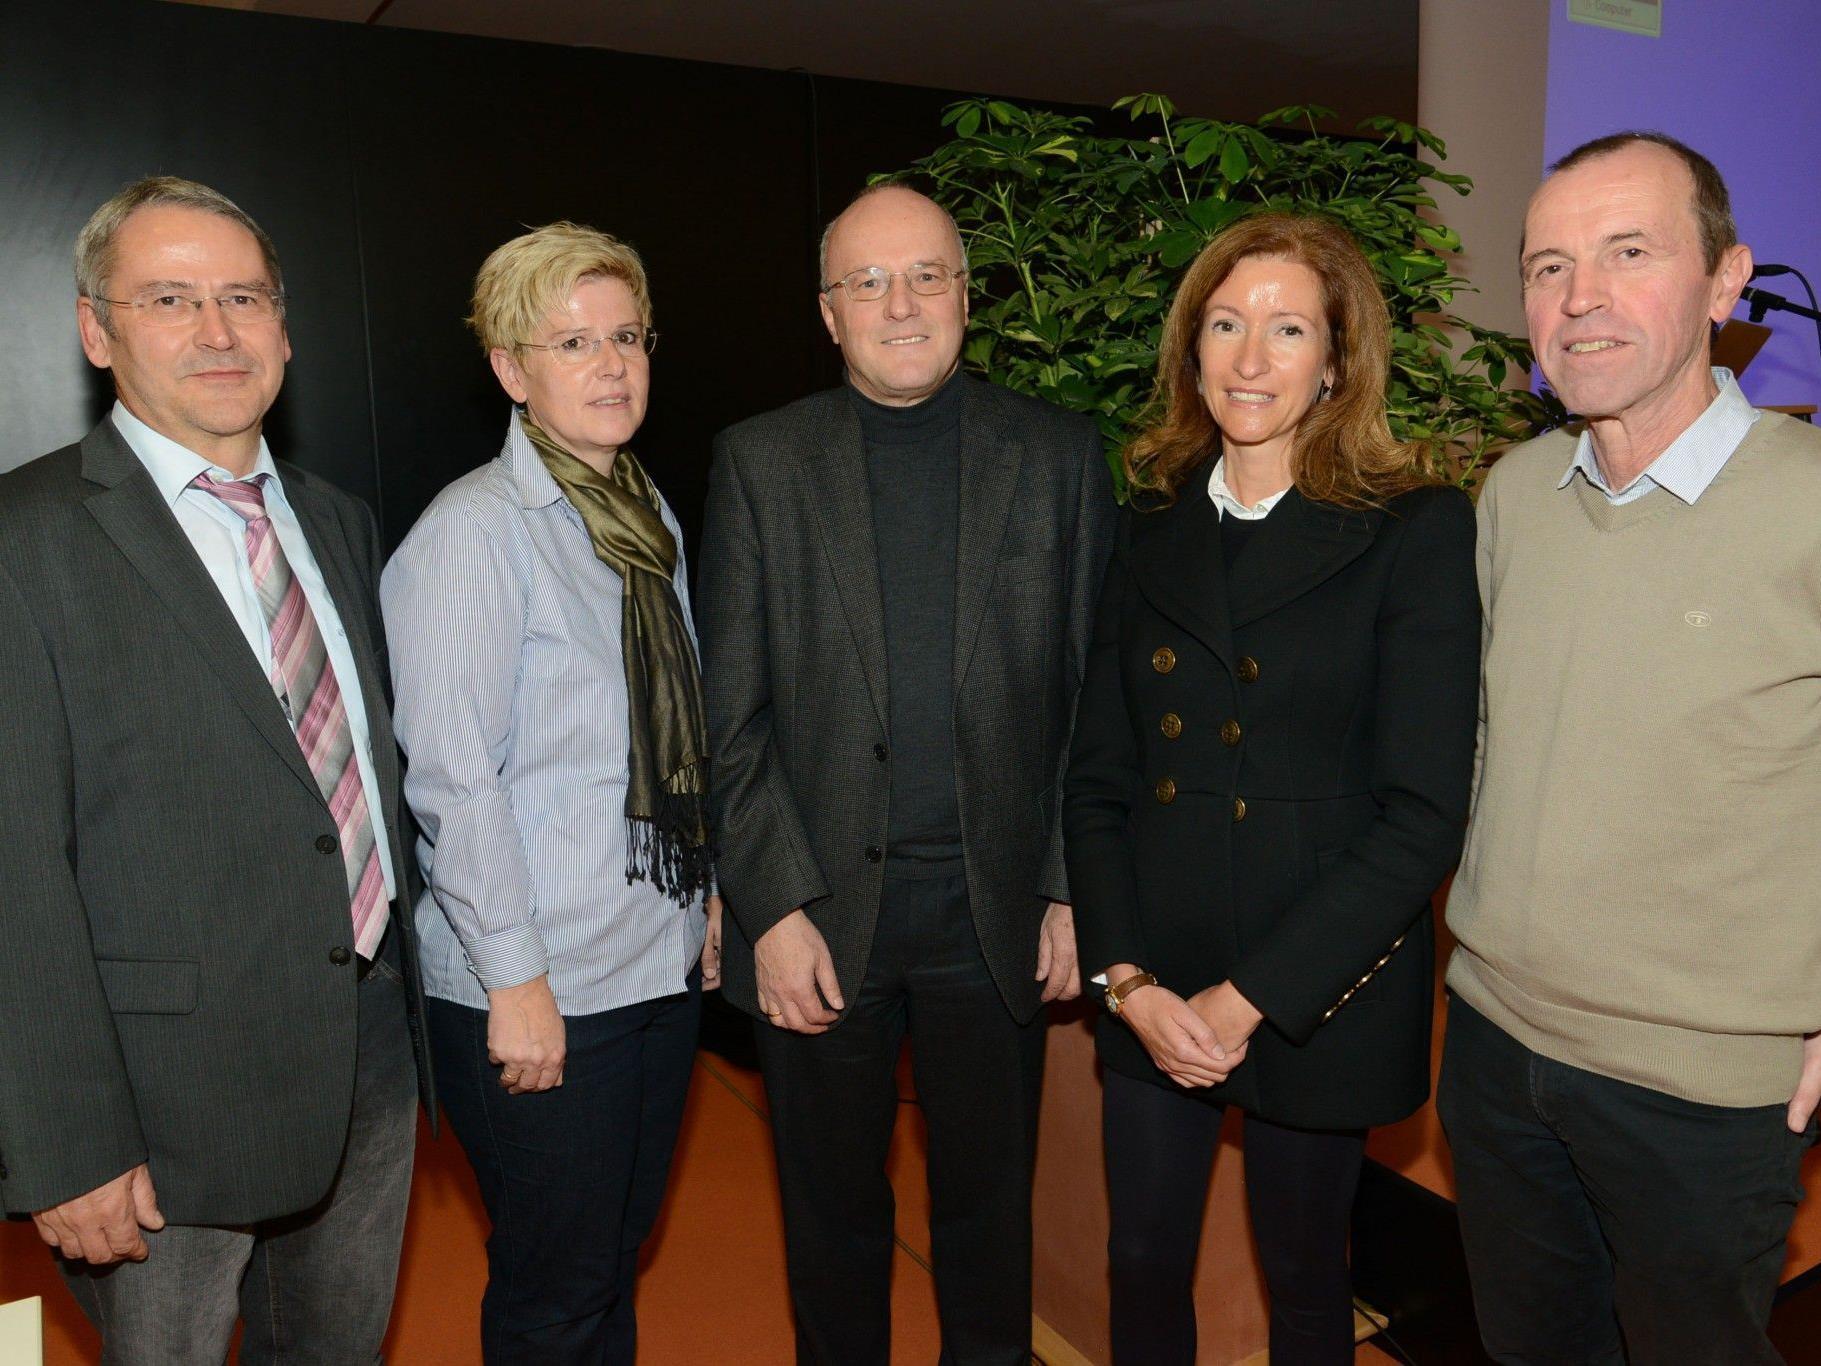 Peter Hutter, Kriehmhild Büchel-Kapeller, Reinhard Haller, Nadja Rhomberg, Thomas Mittelberger.